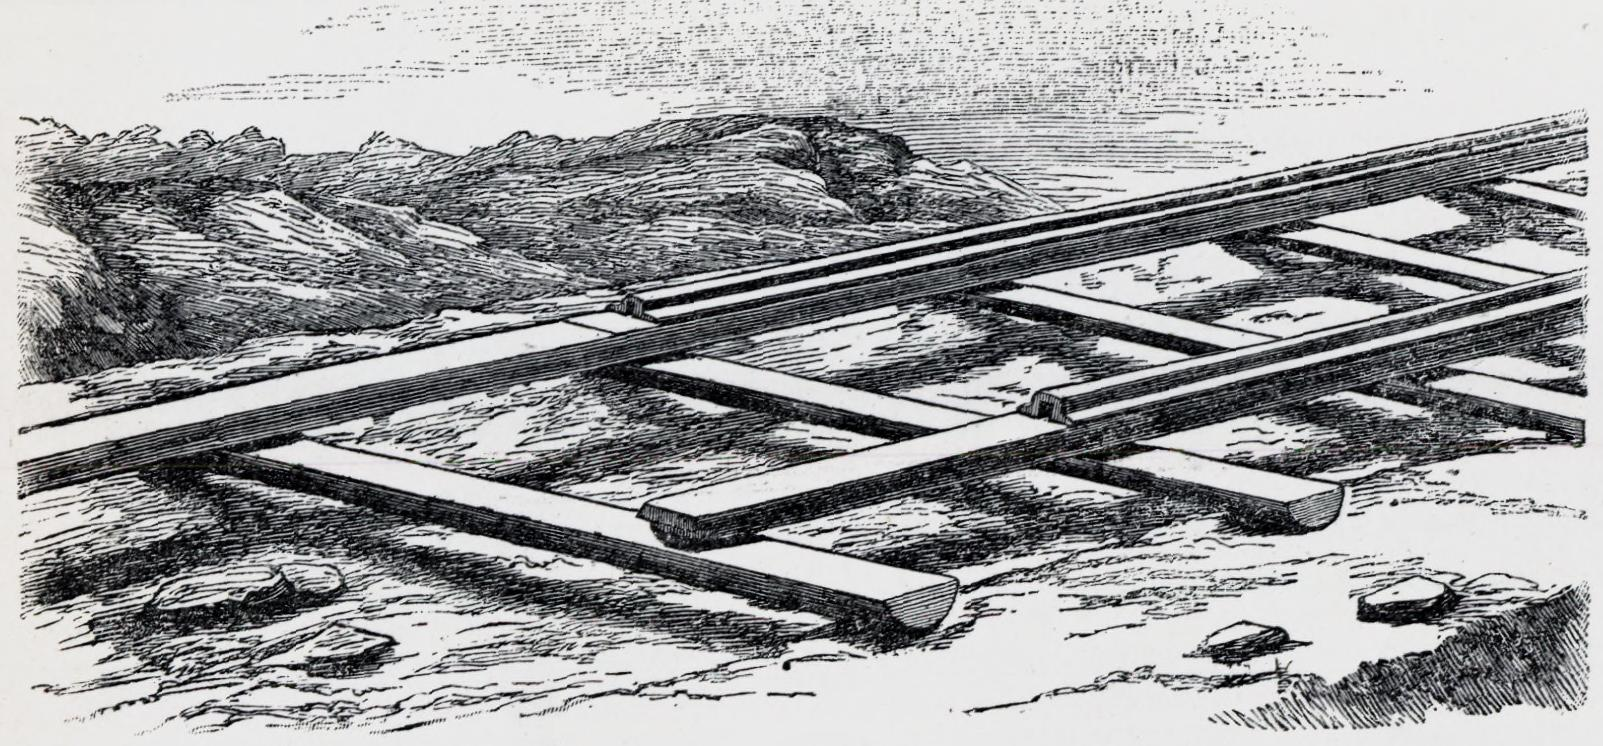 Illustration of the early railway tracks. | Illustration: Yngvar Nielsen - Gyldendal Wikimedia cc pdm.